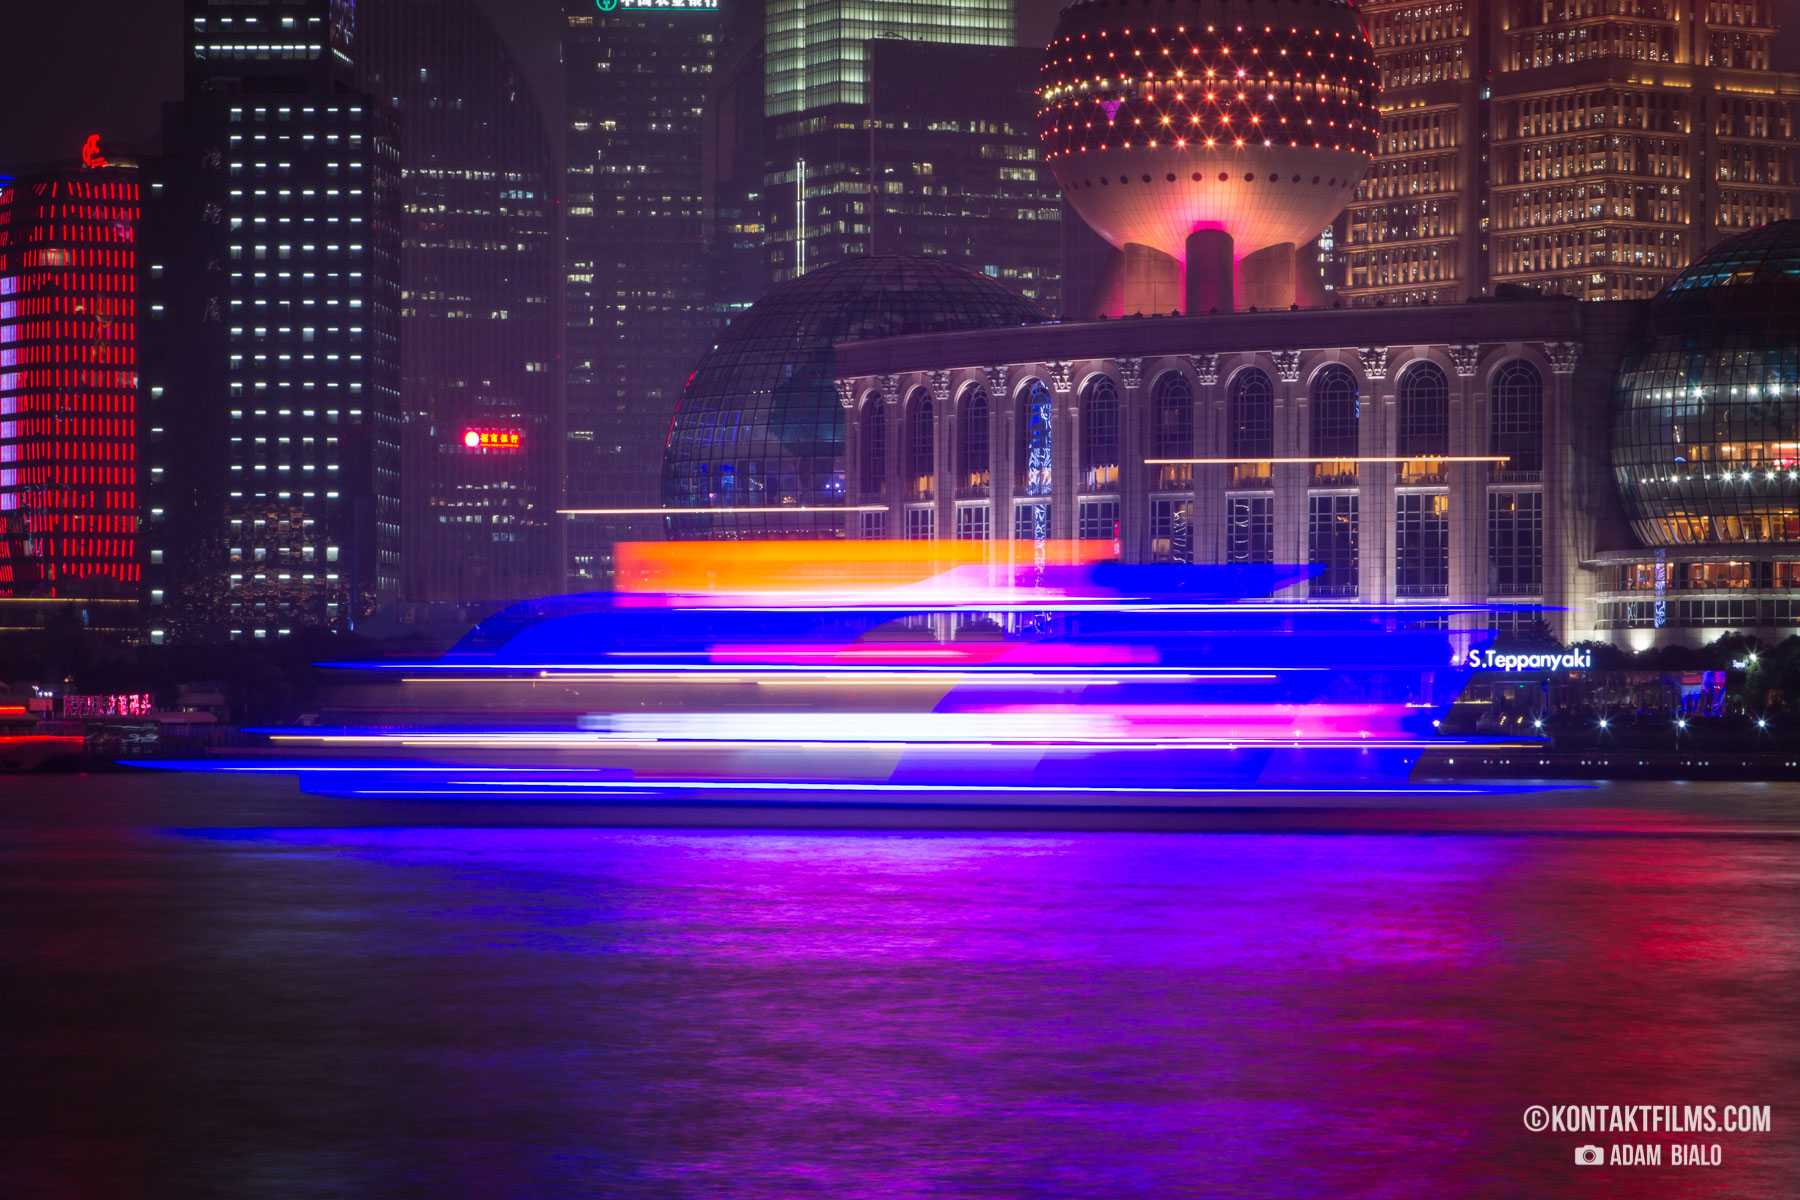 Huangpu River boat neon oriental pearl tower bund district shanghai china kontakt films adam bialo